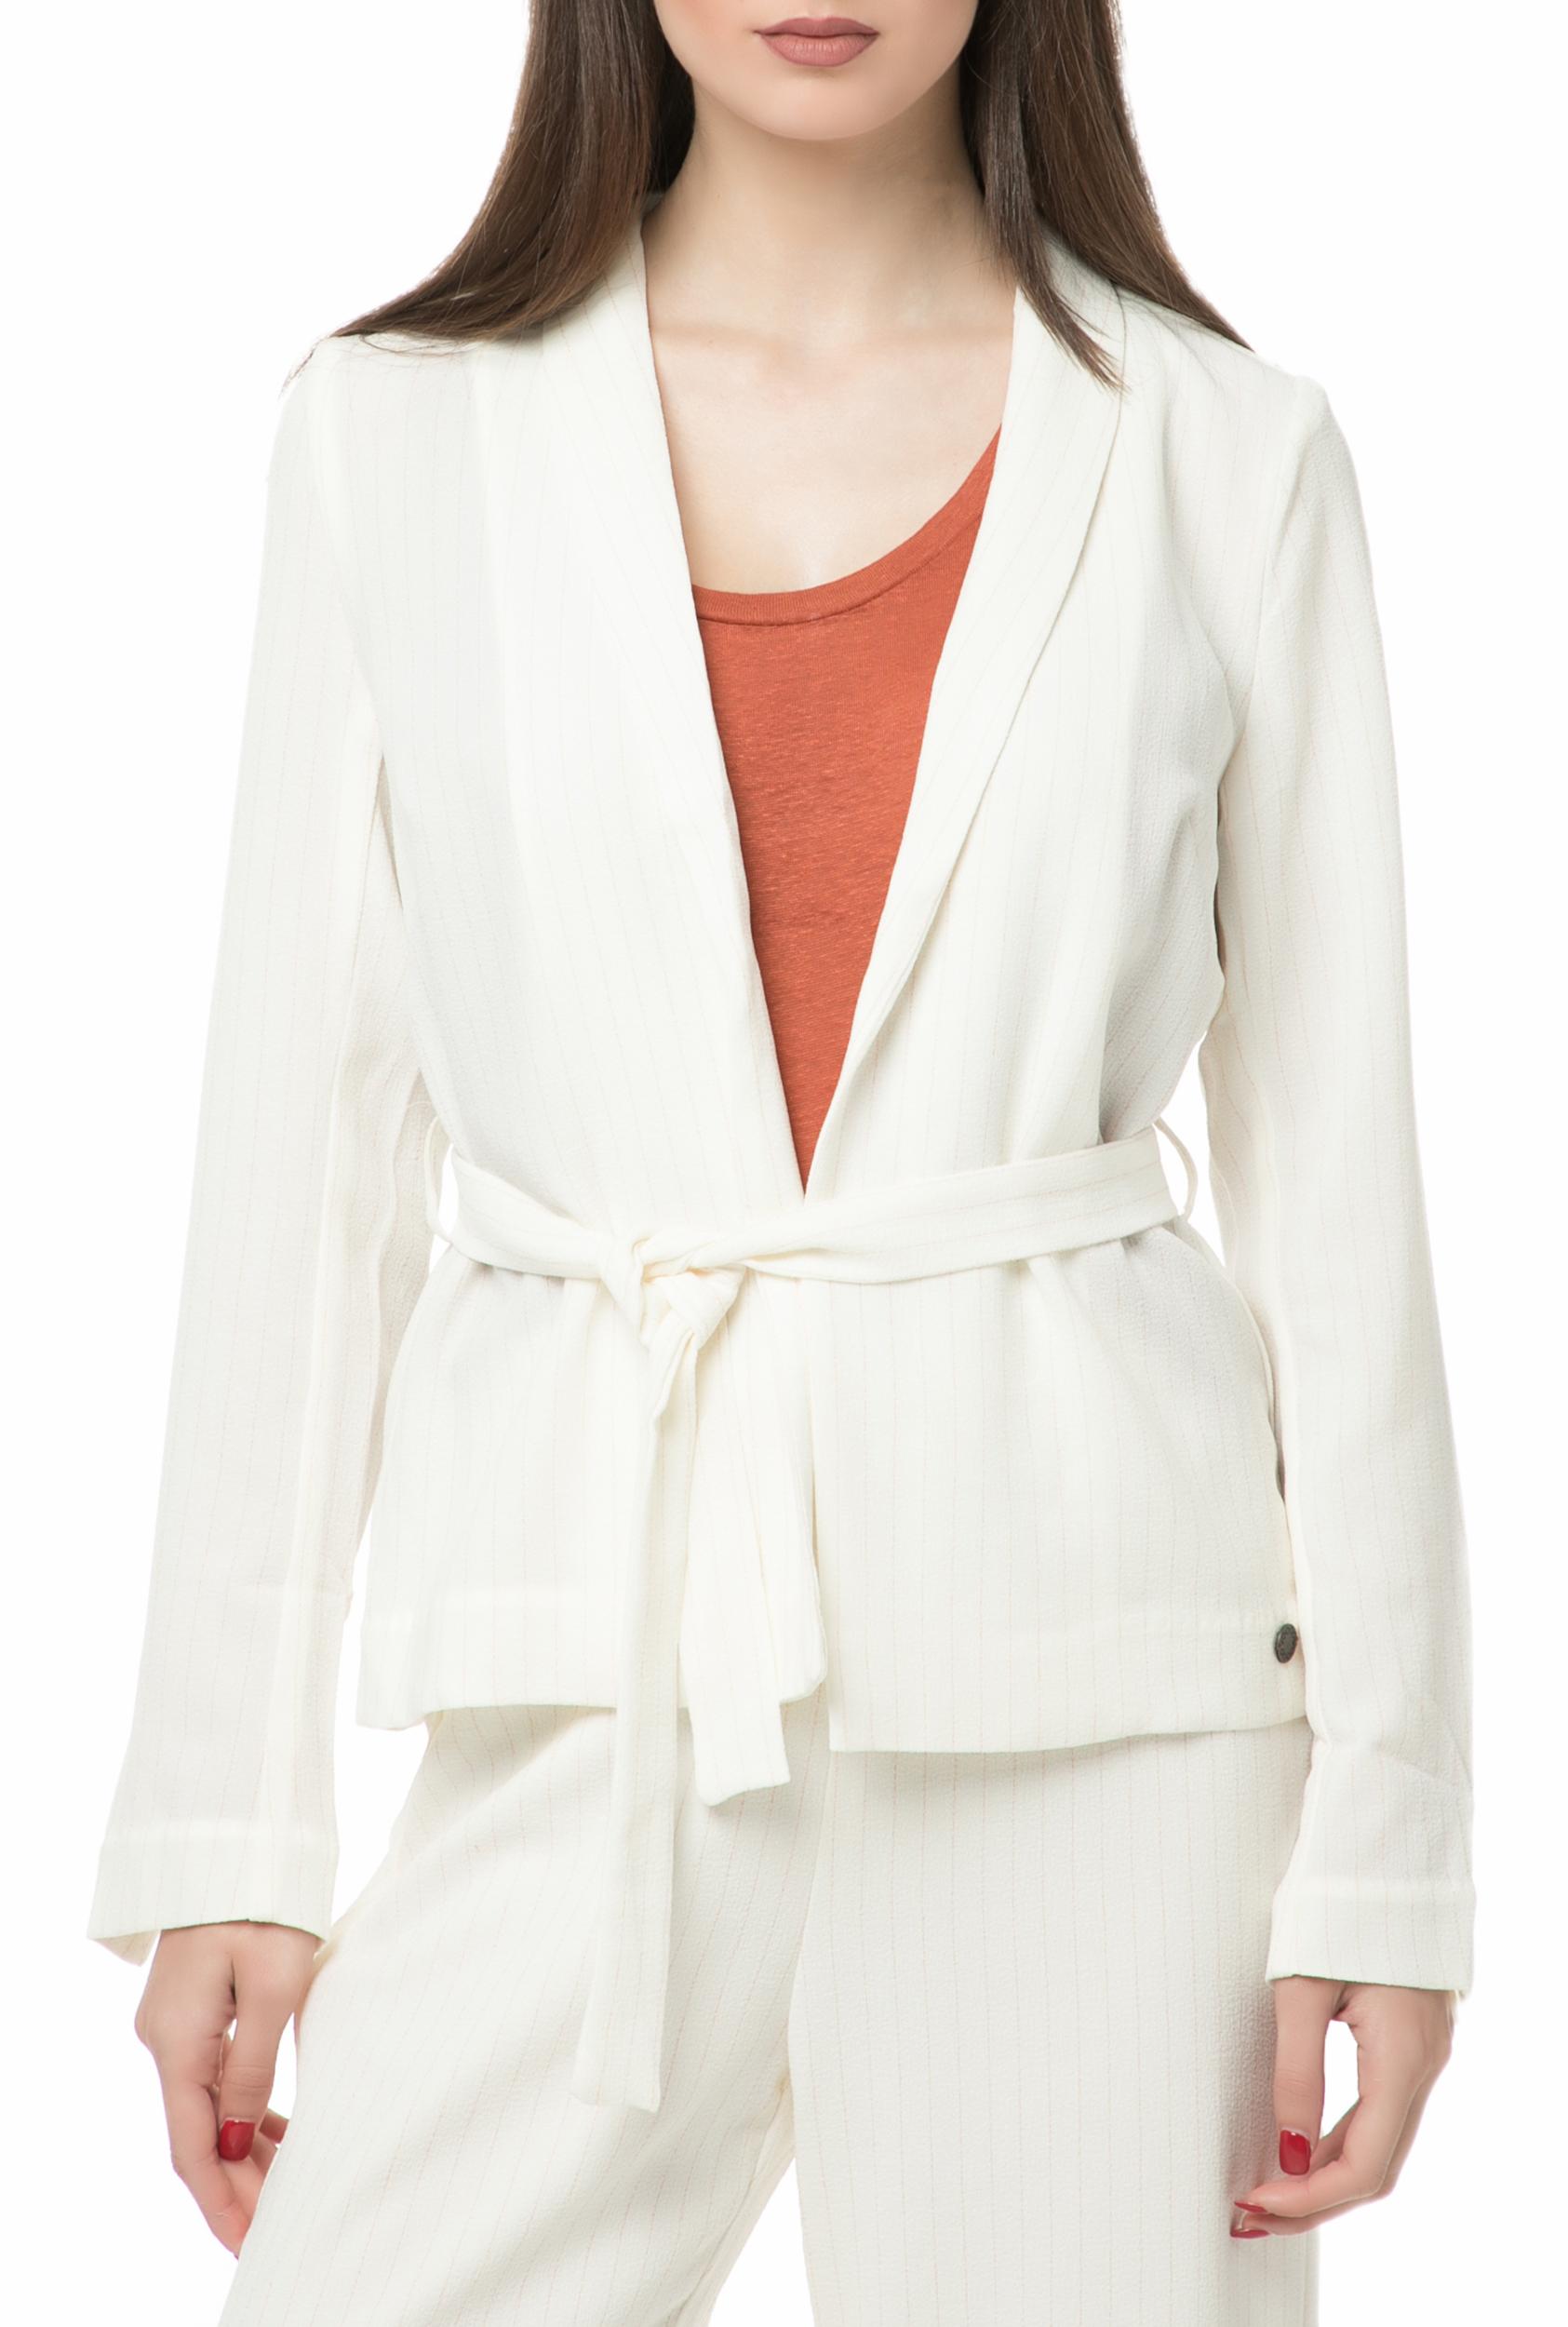 NUMPH - Γυναικείο σακάκι NUMPH εκρού γυναικεία ρούχα πανωφόρια σακάκια